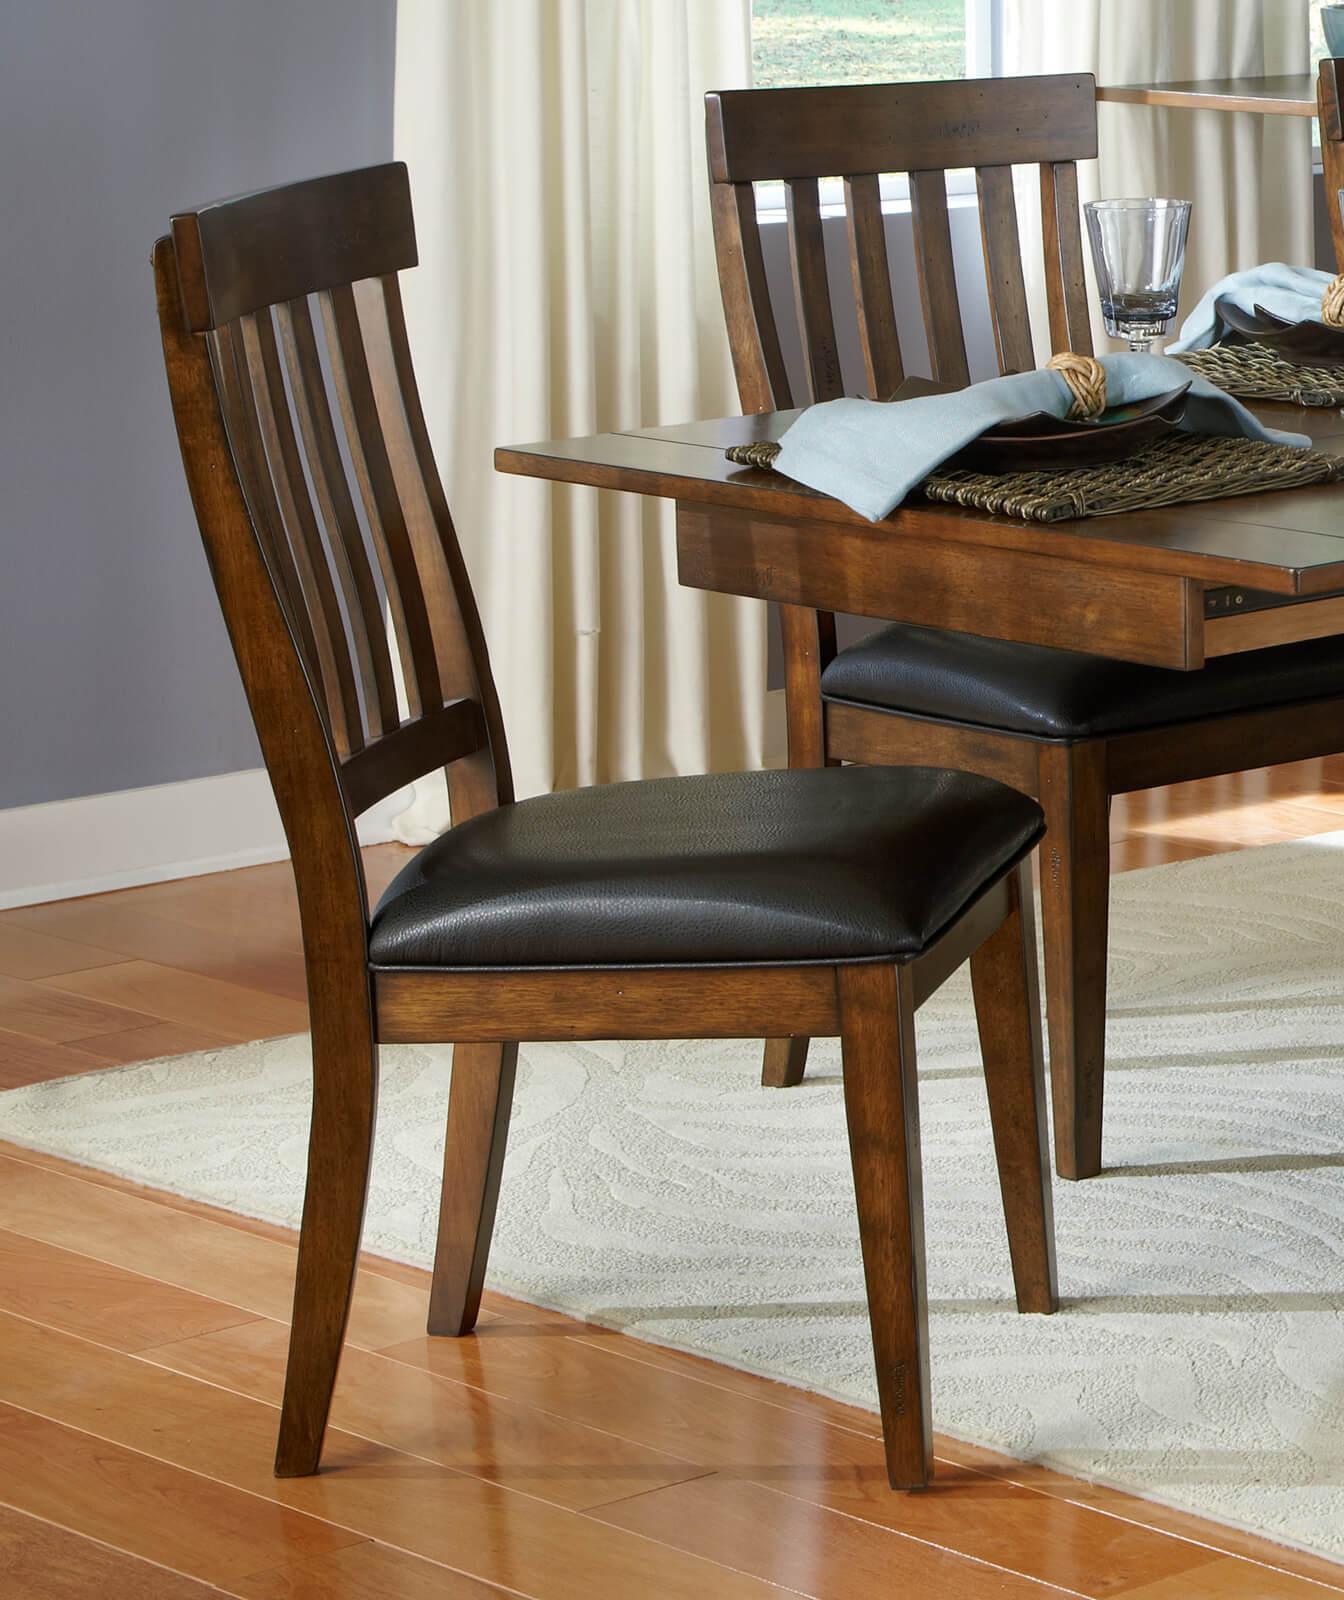 AAmerica Mariposa Slatback Chair Rustic Whiskey